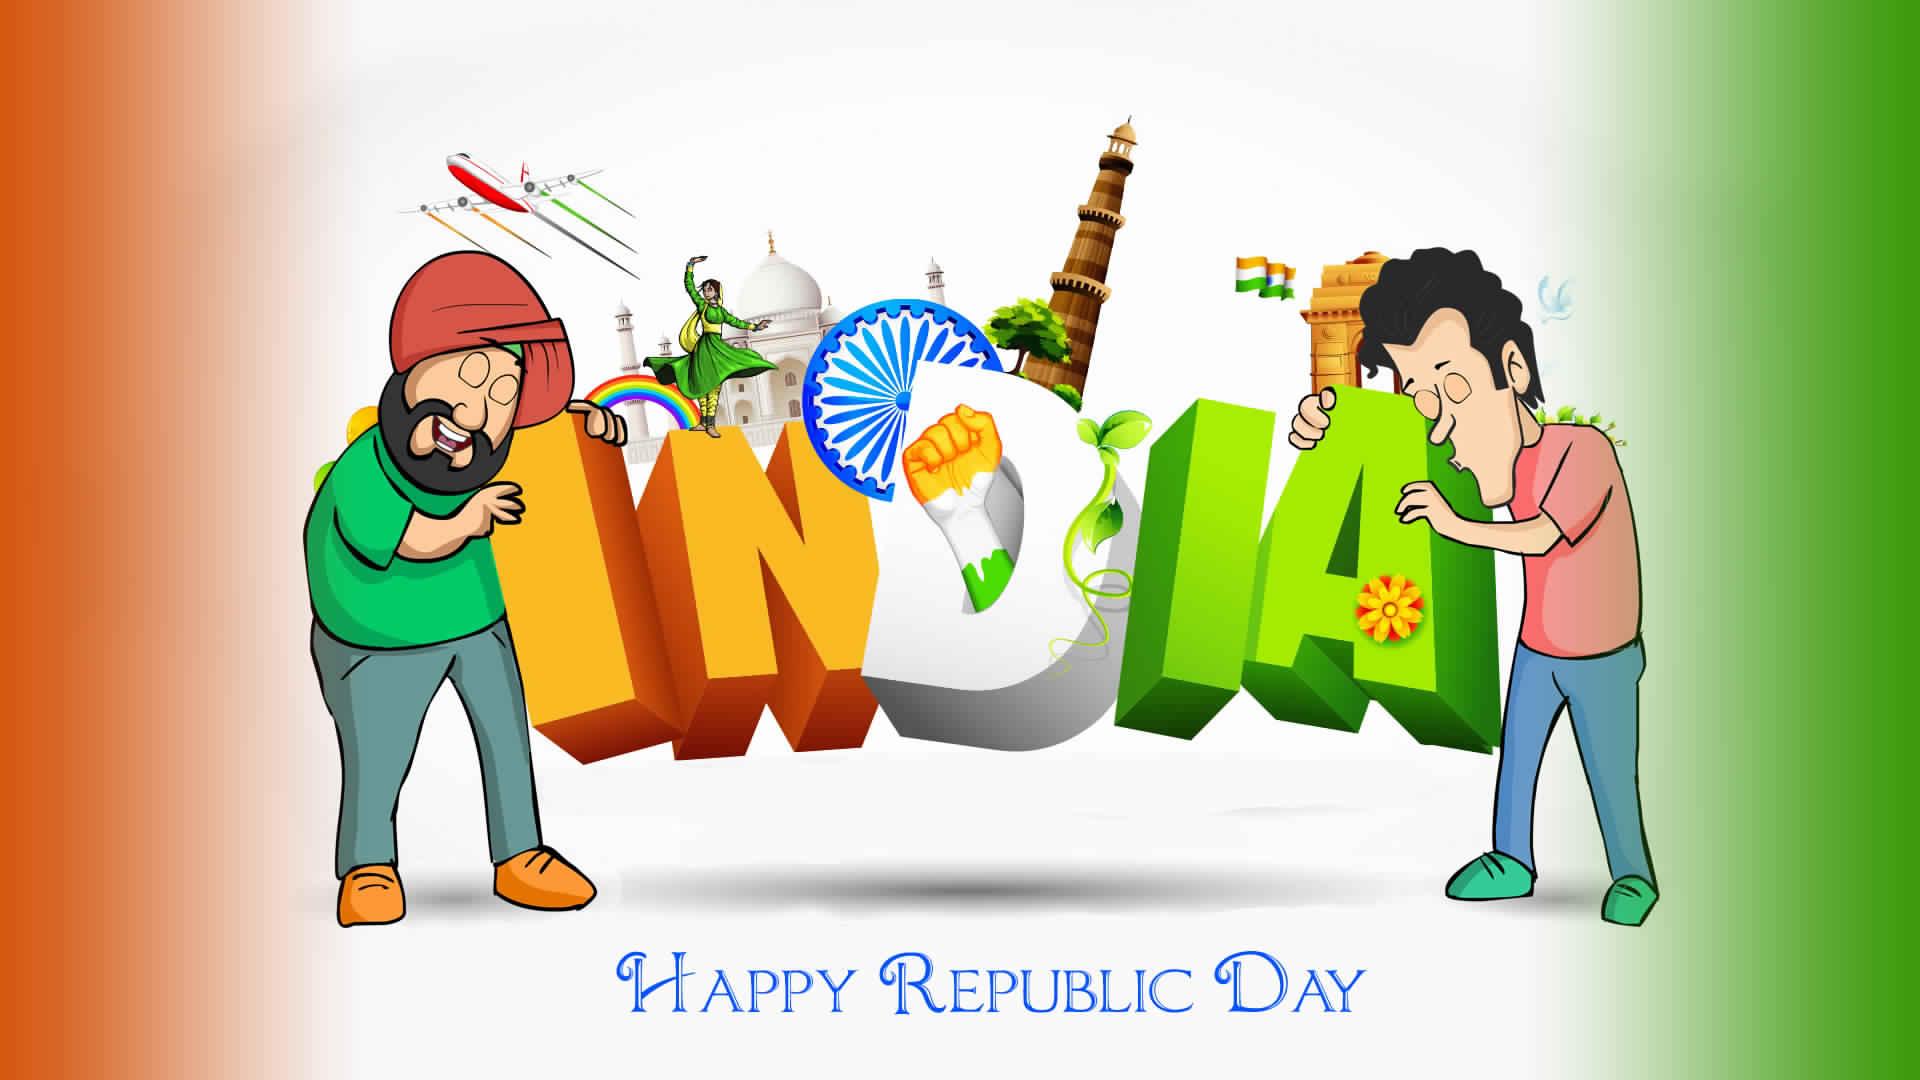 Republic Day Hd Wallpaper For Facebook Dp Free Download Festivals